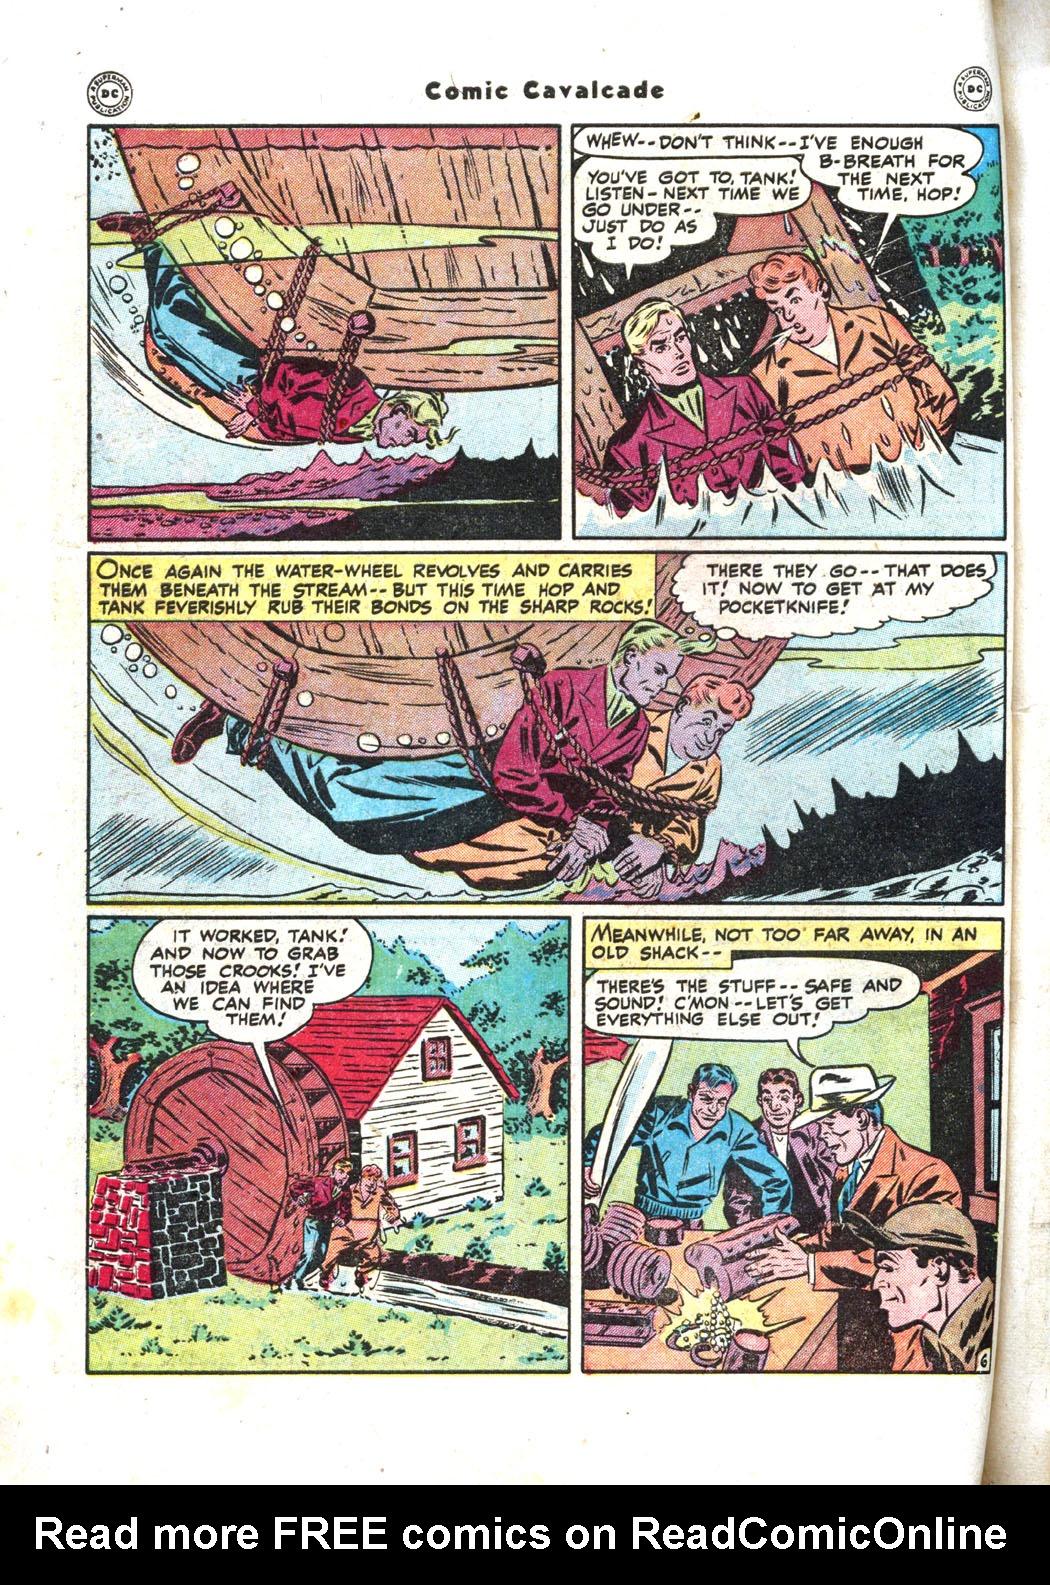 Comic Cavalcade issue 26 - Page 54